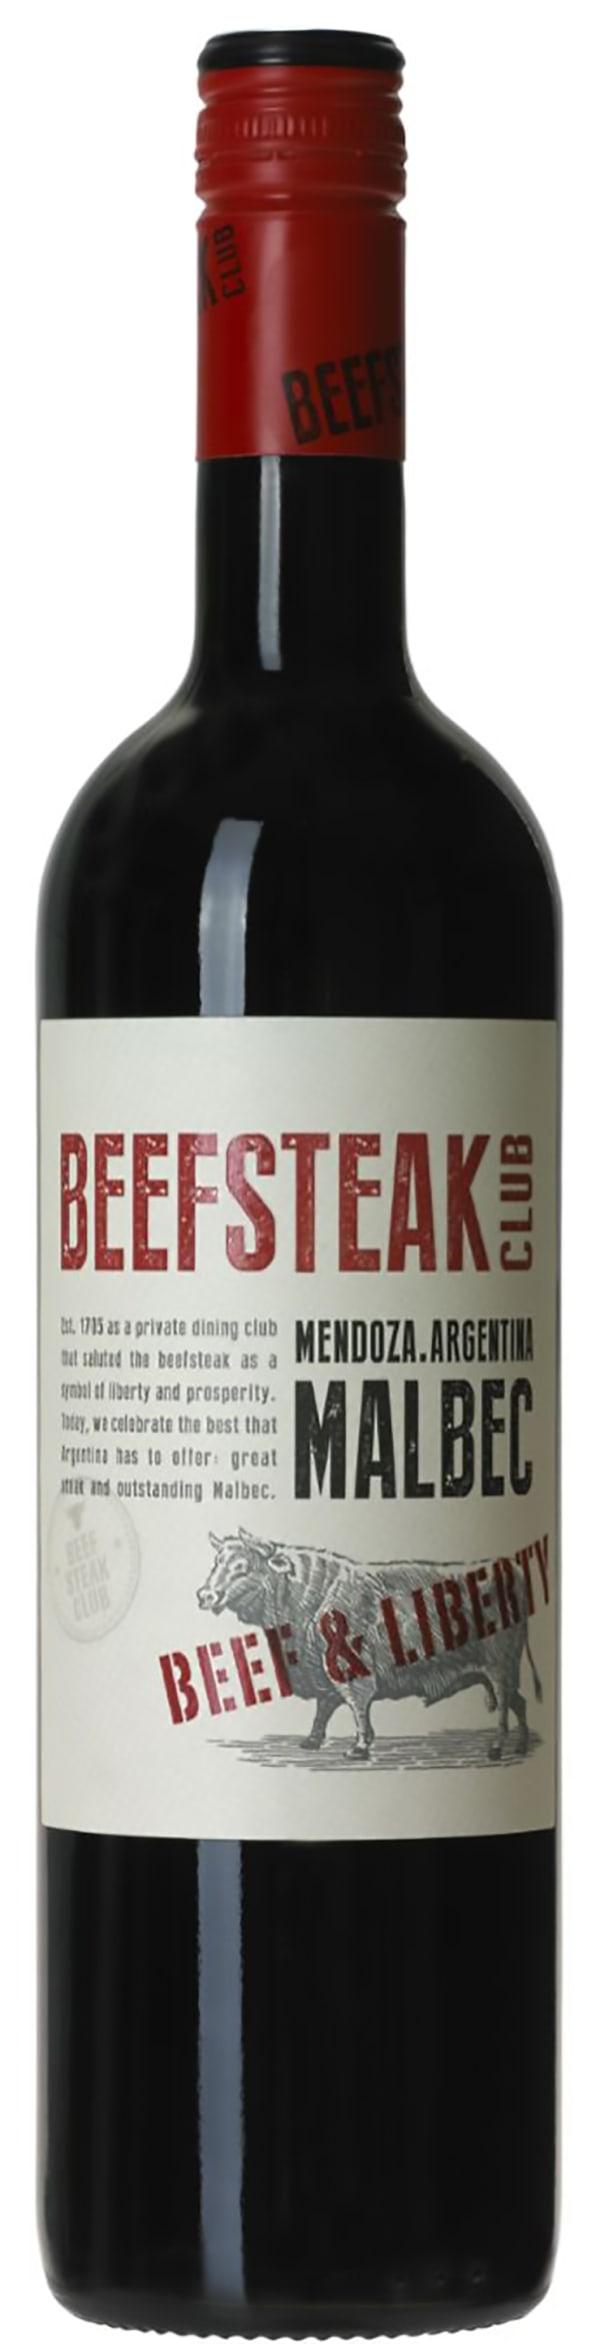 Beefsteak Club Malbec 2017